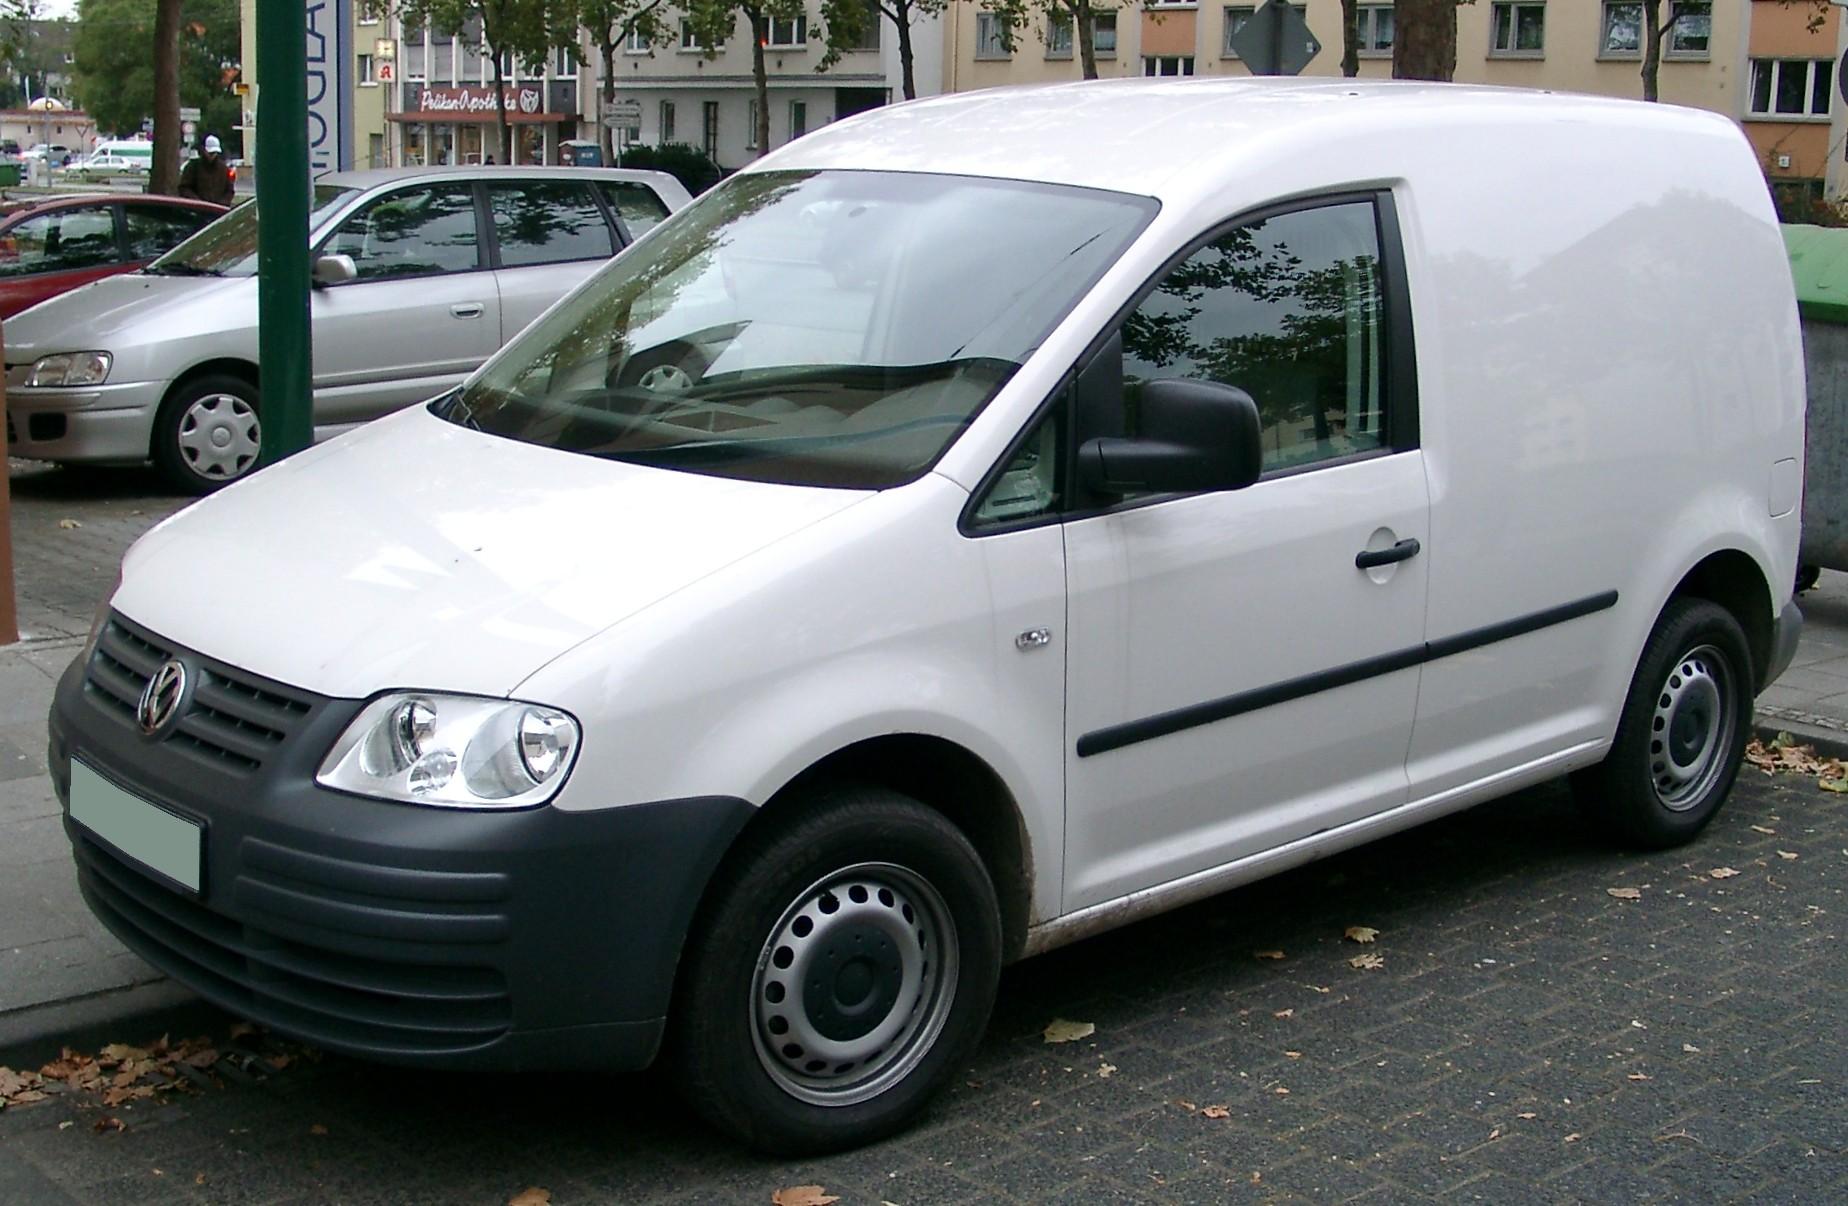 Verrassend Volkswagen Caddy (2K) - Wikipedia, den frie encyklopædi JK-64